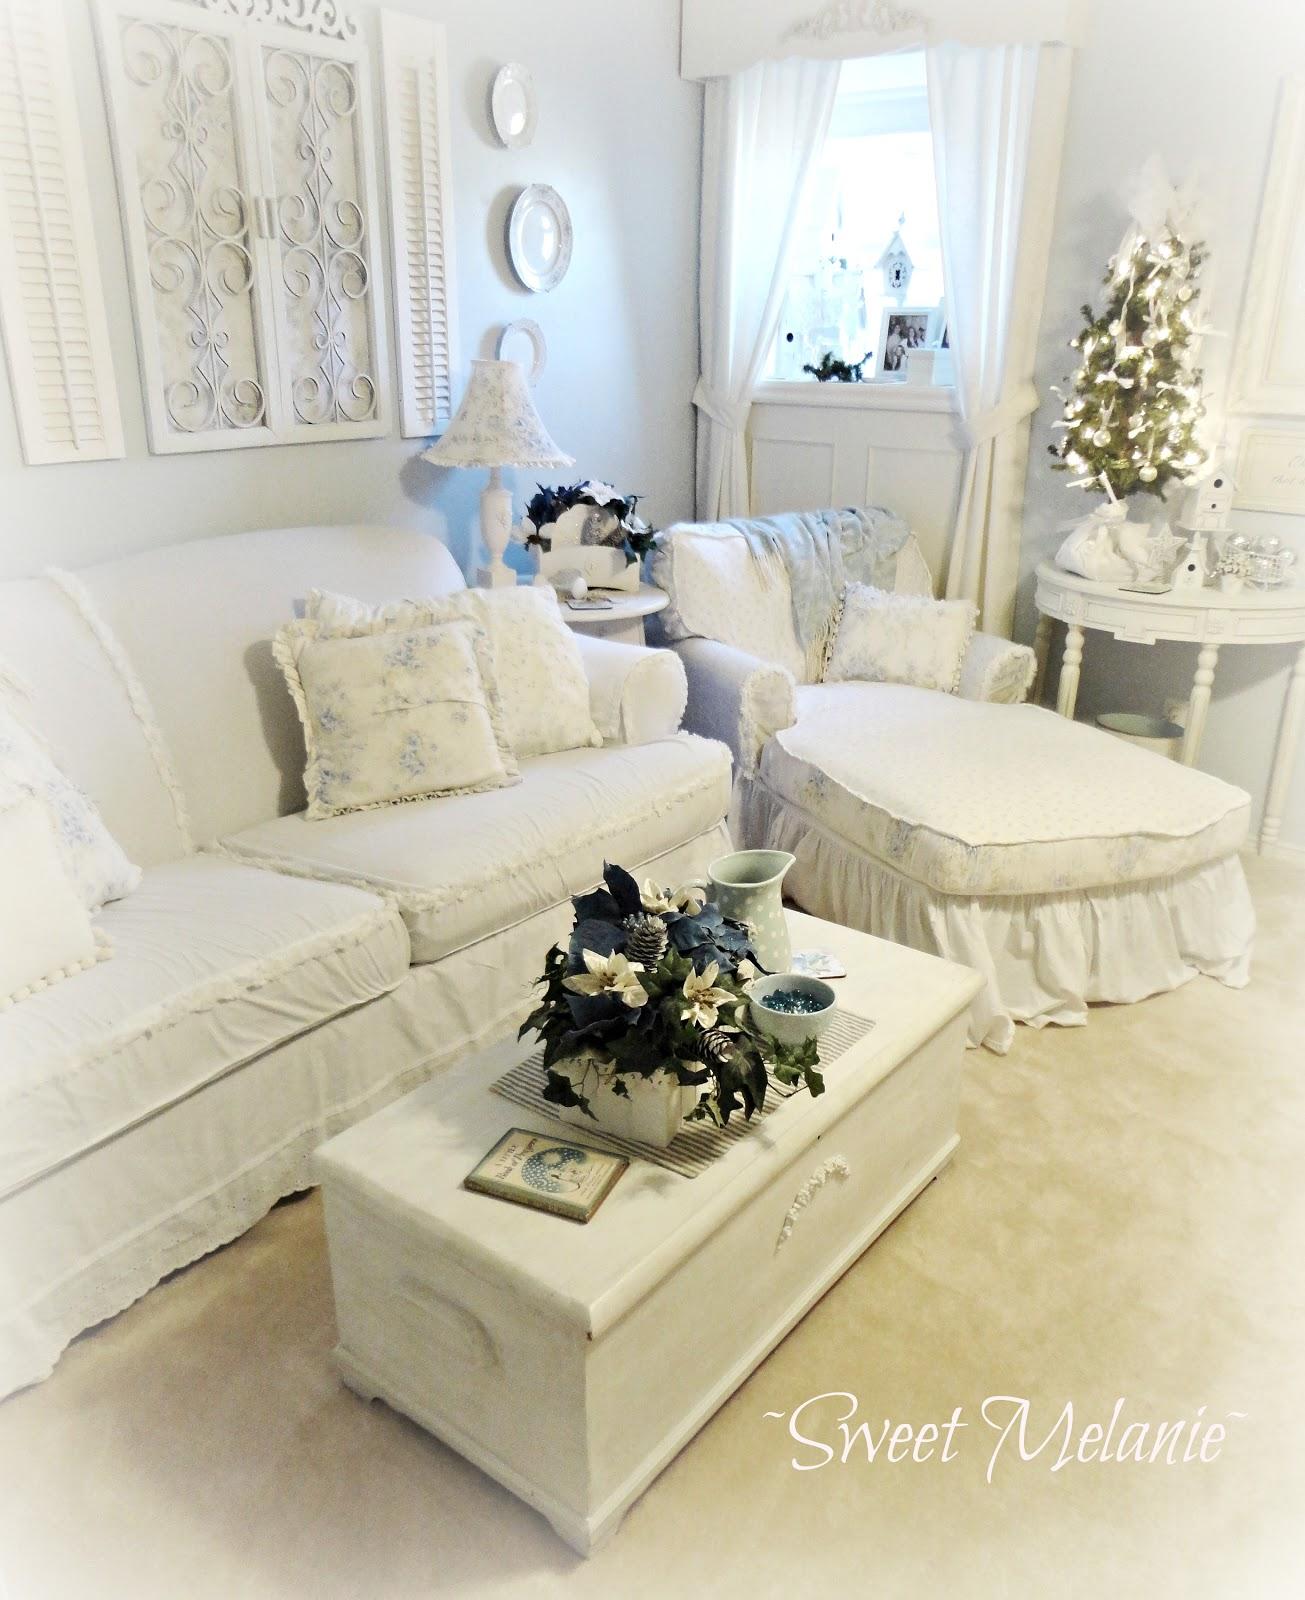 Olivia's Romantic Home: Sweet Melanie's Holiday Home Tour